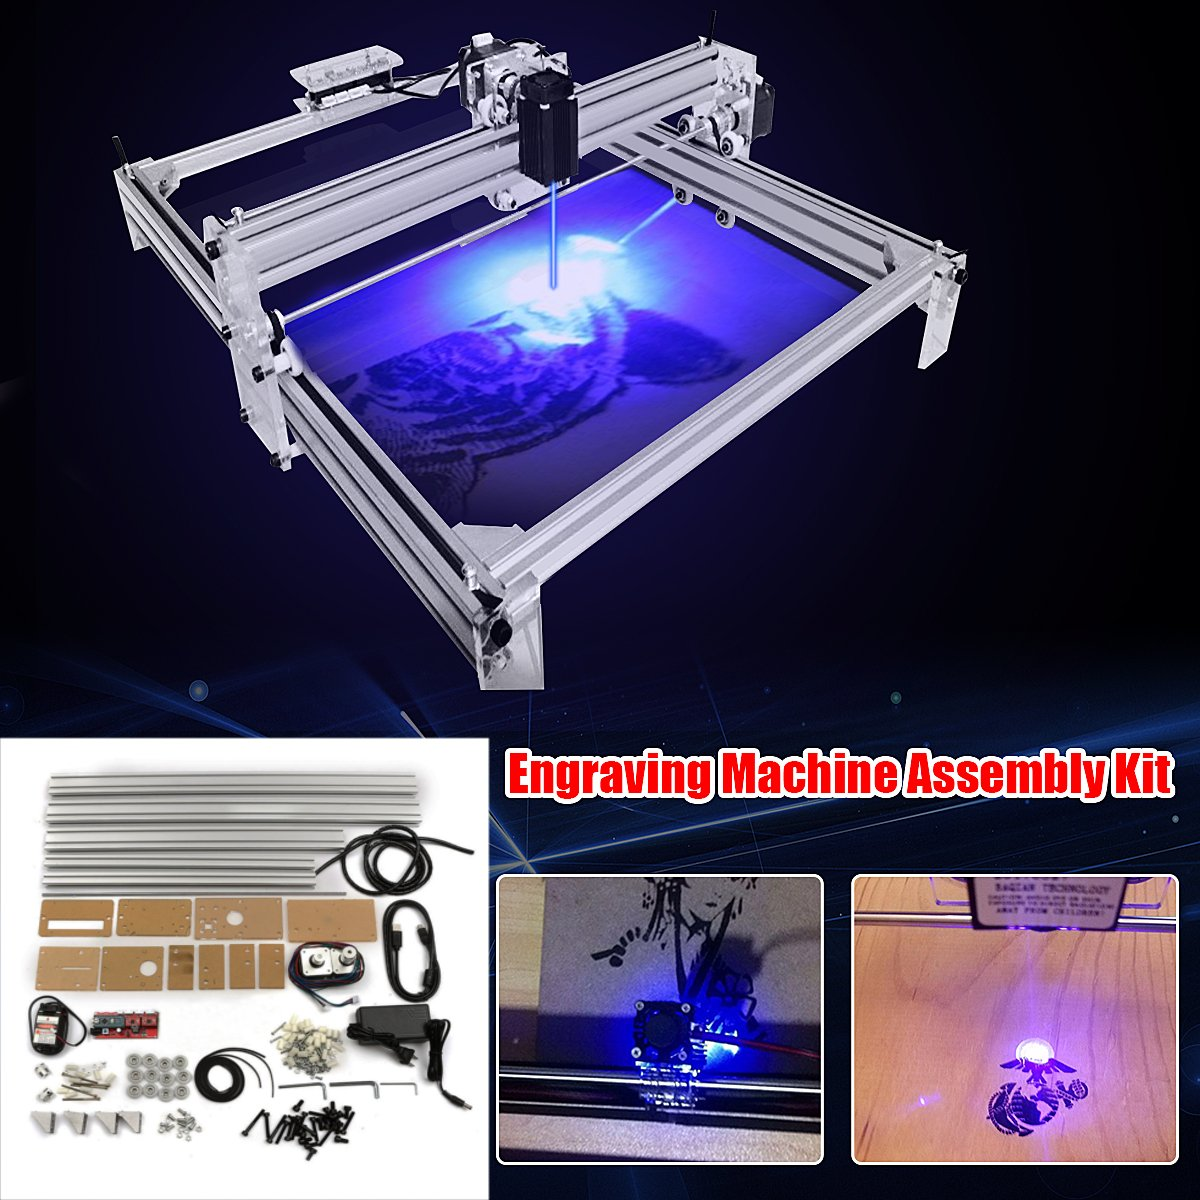 40X50CM DIY Desktop Mini Blue Laser 500mW Engraving Engraver Machine Wood Router/Cutter/Printer/Power Adjustable No Laser Goggle